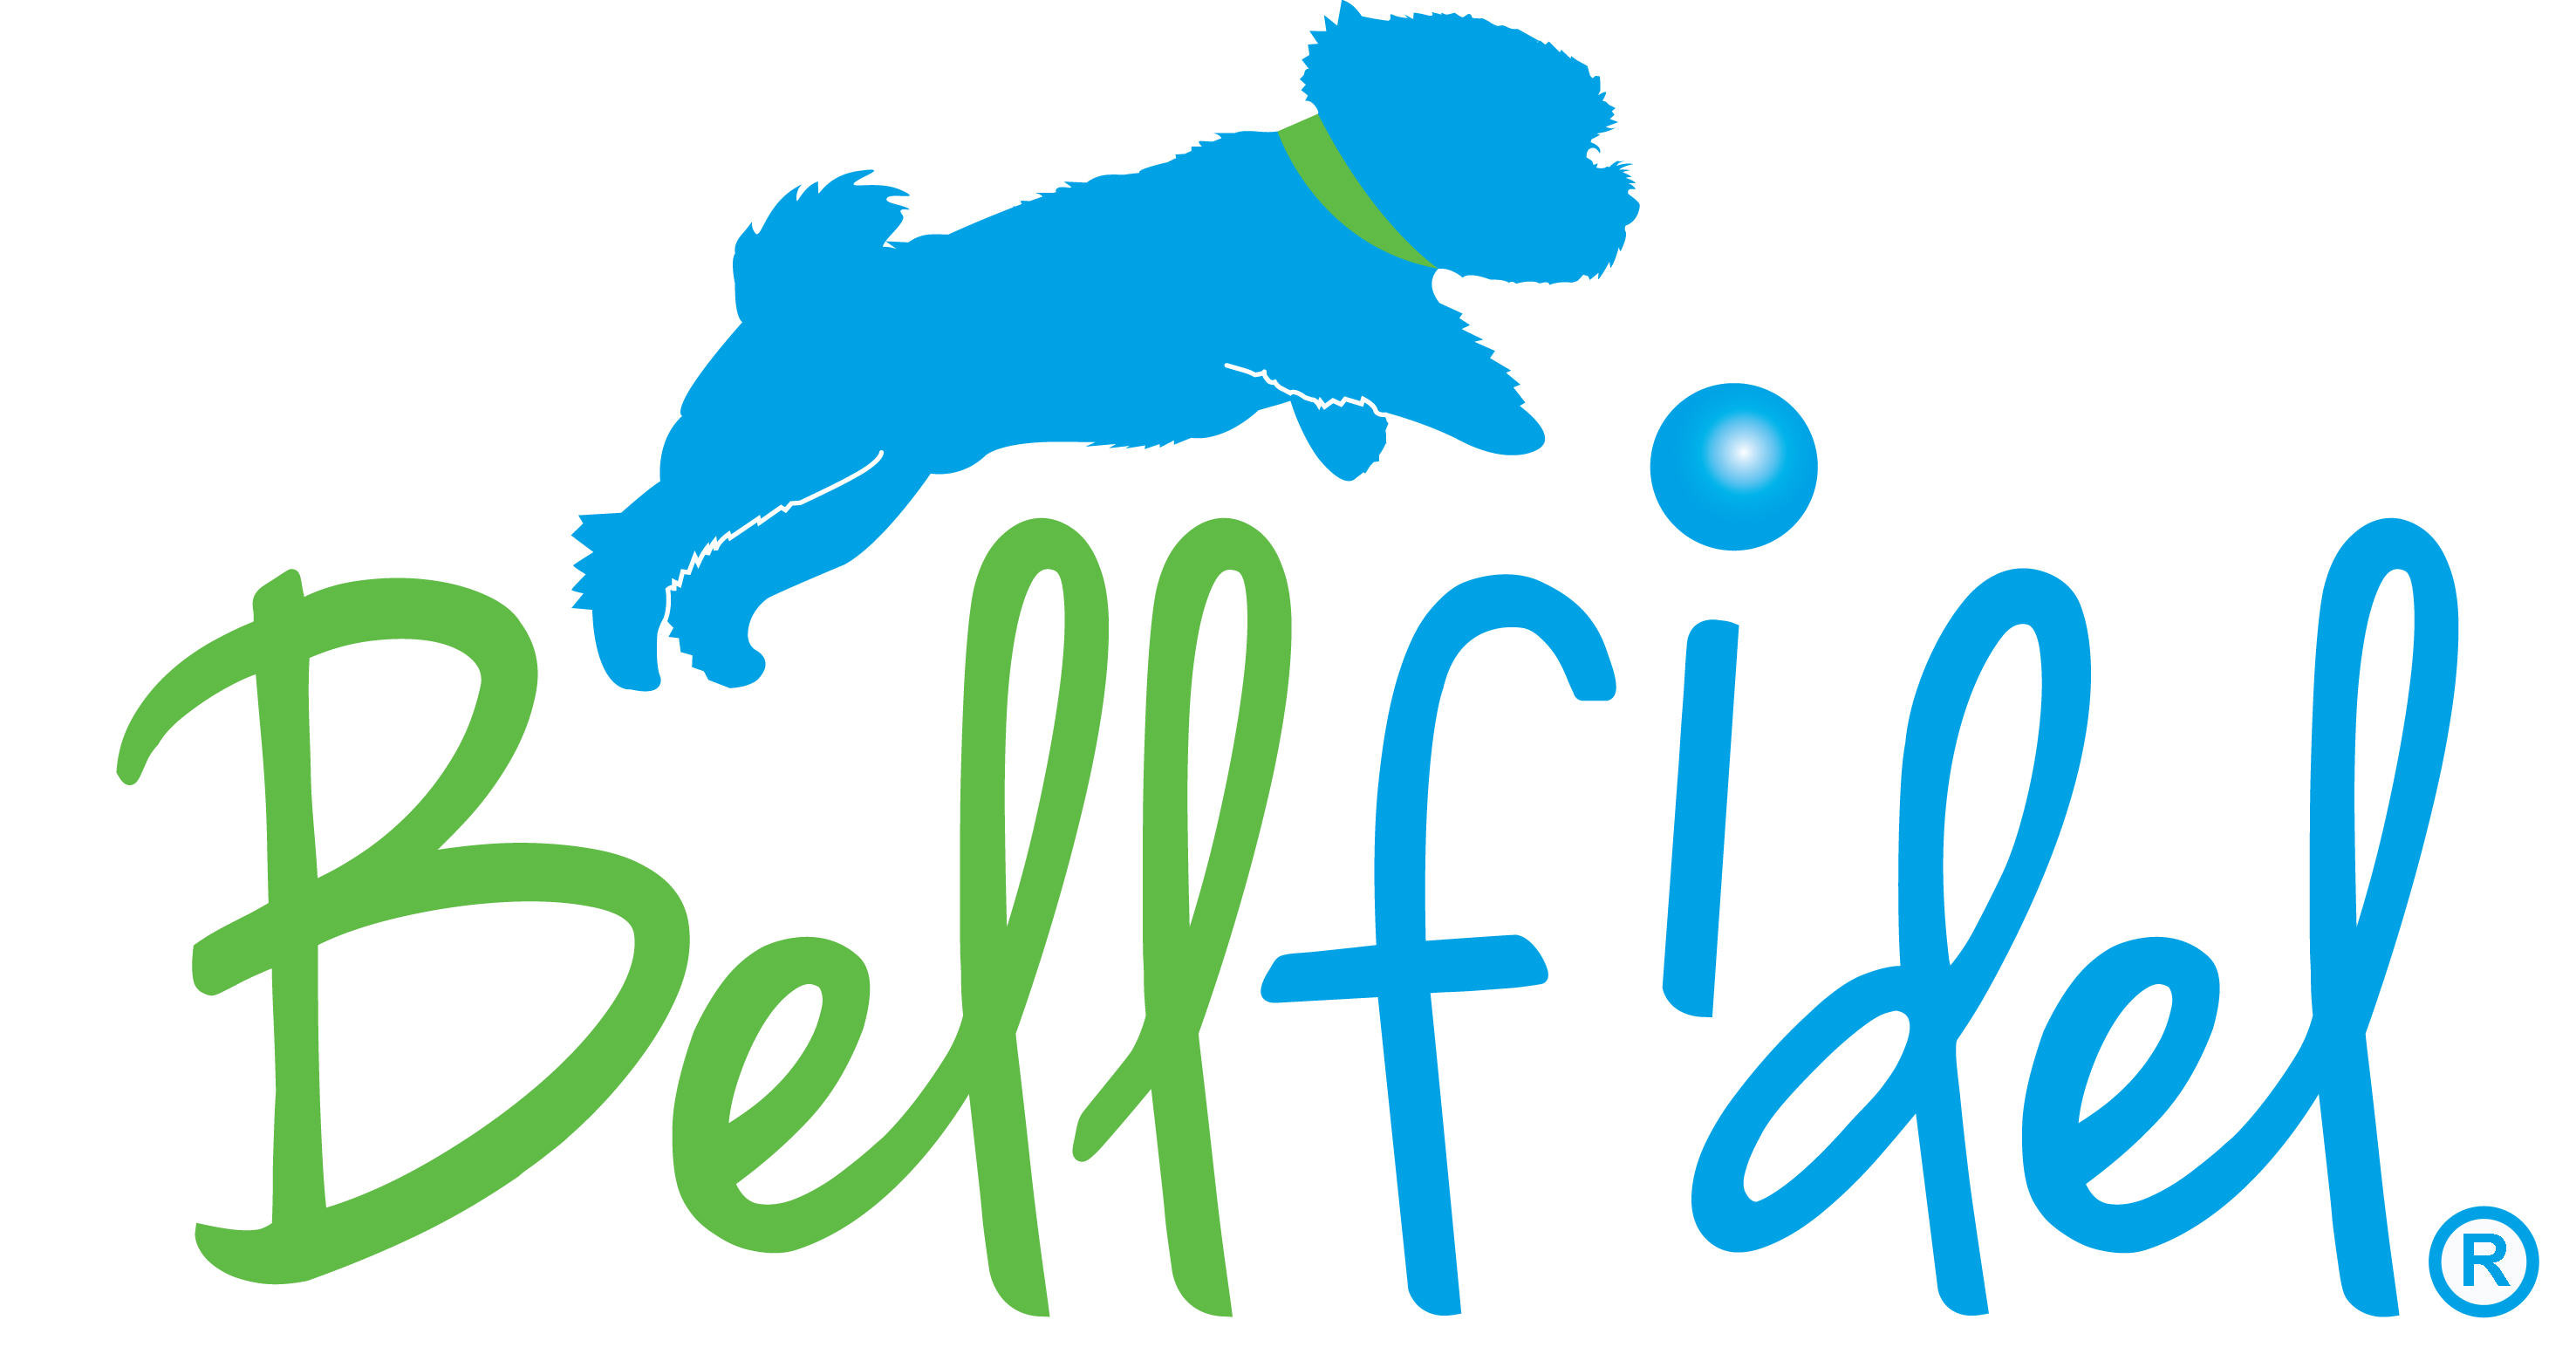 Bellfidel